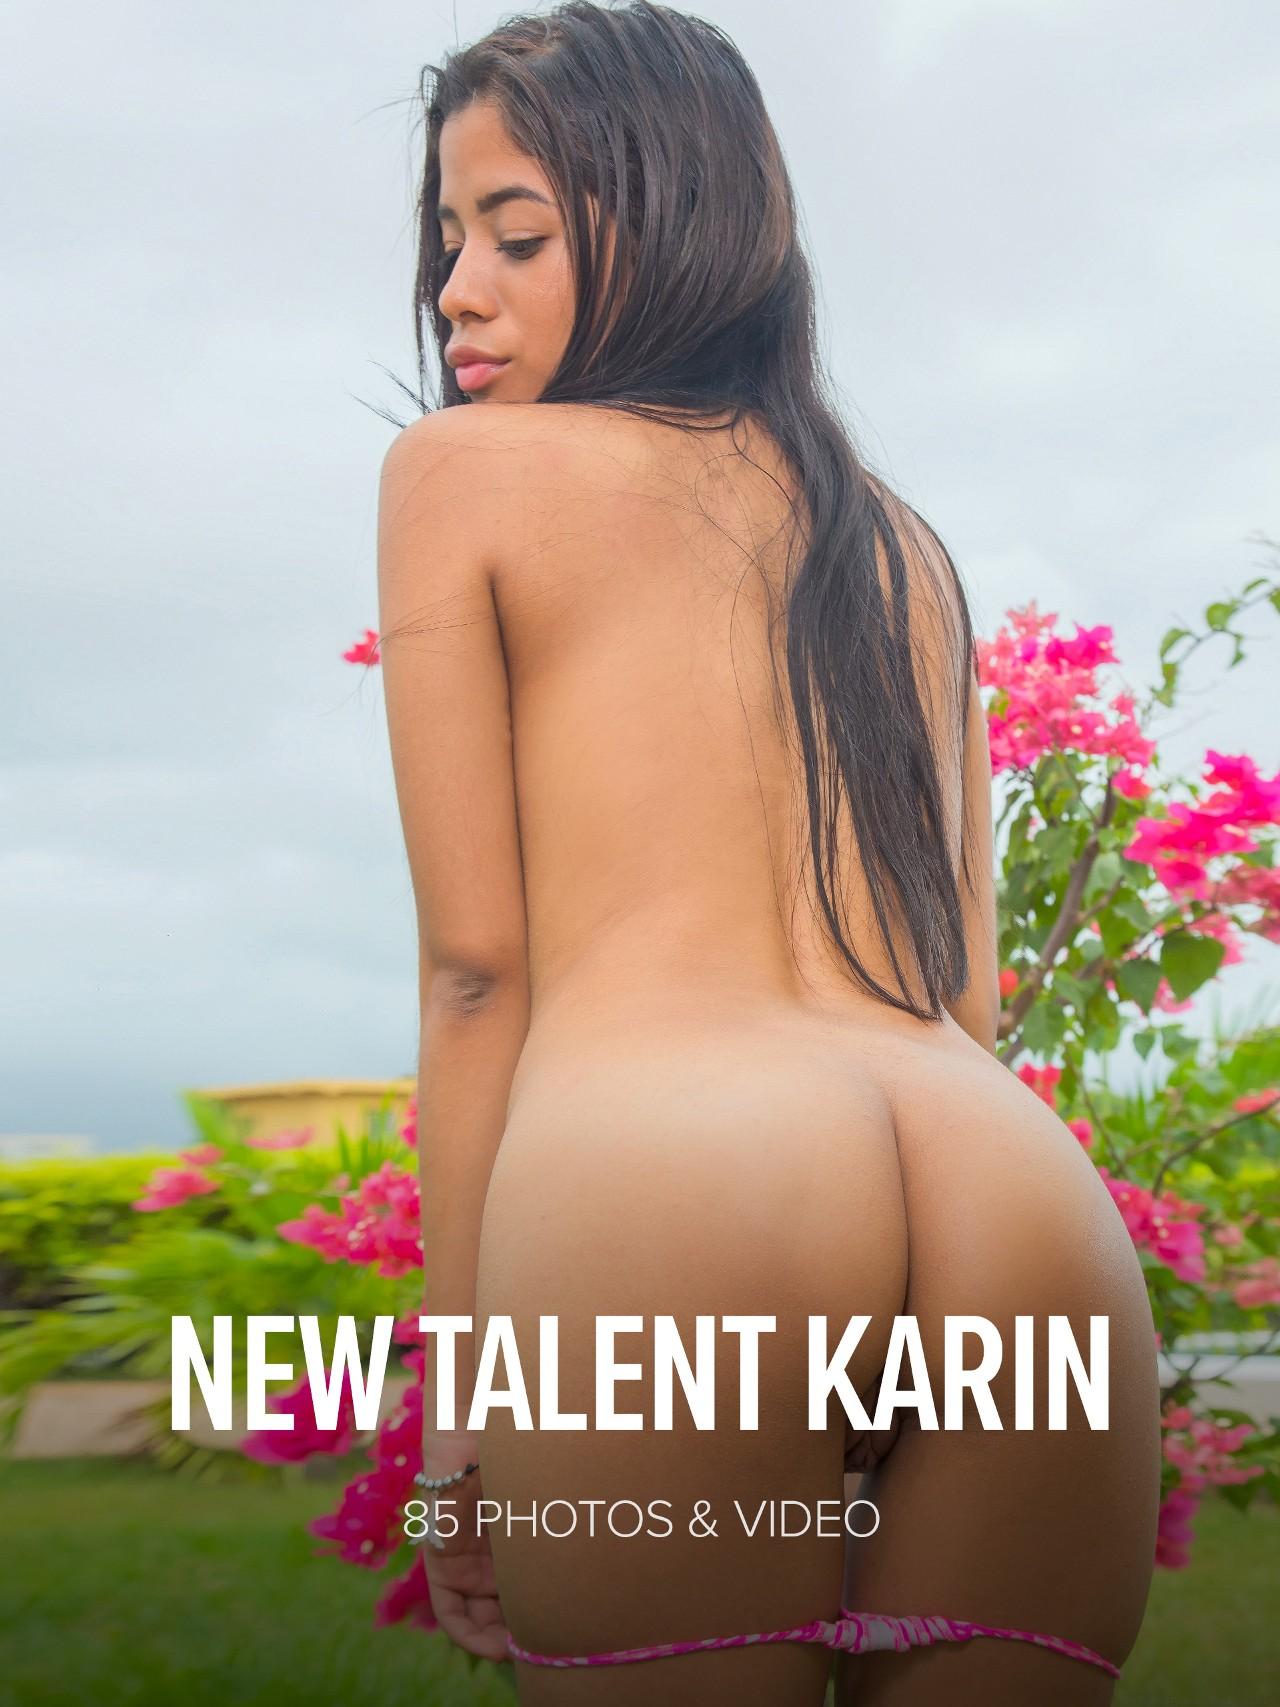 Karin Torres: New Talent Karin